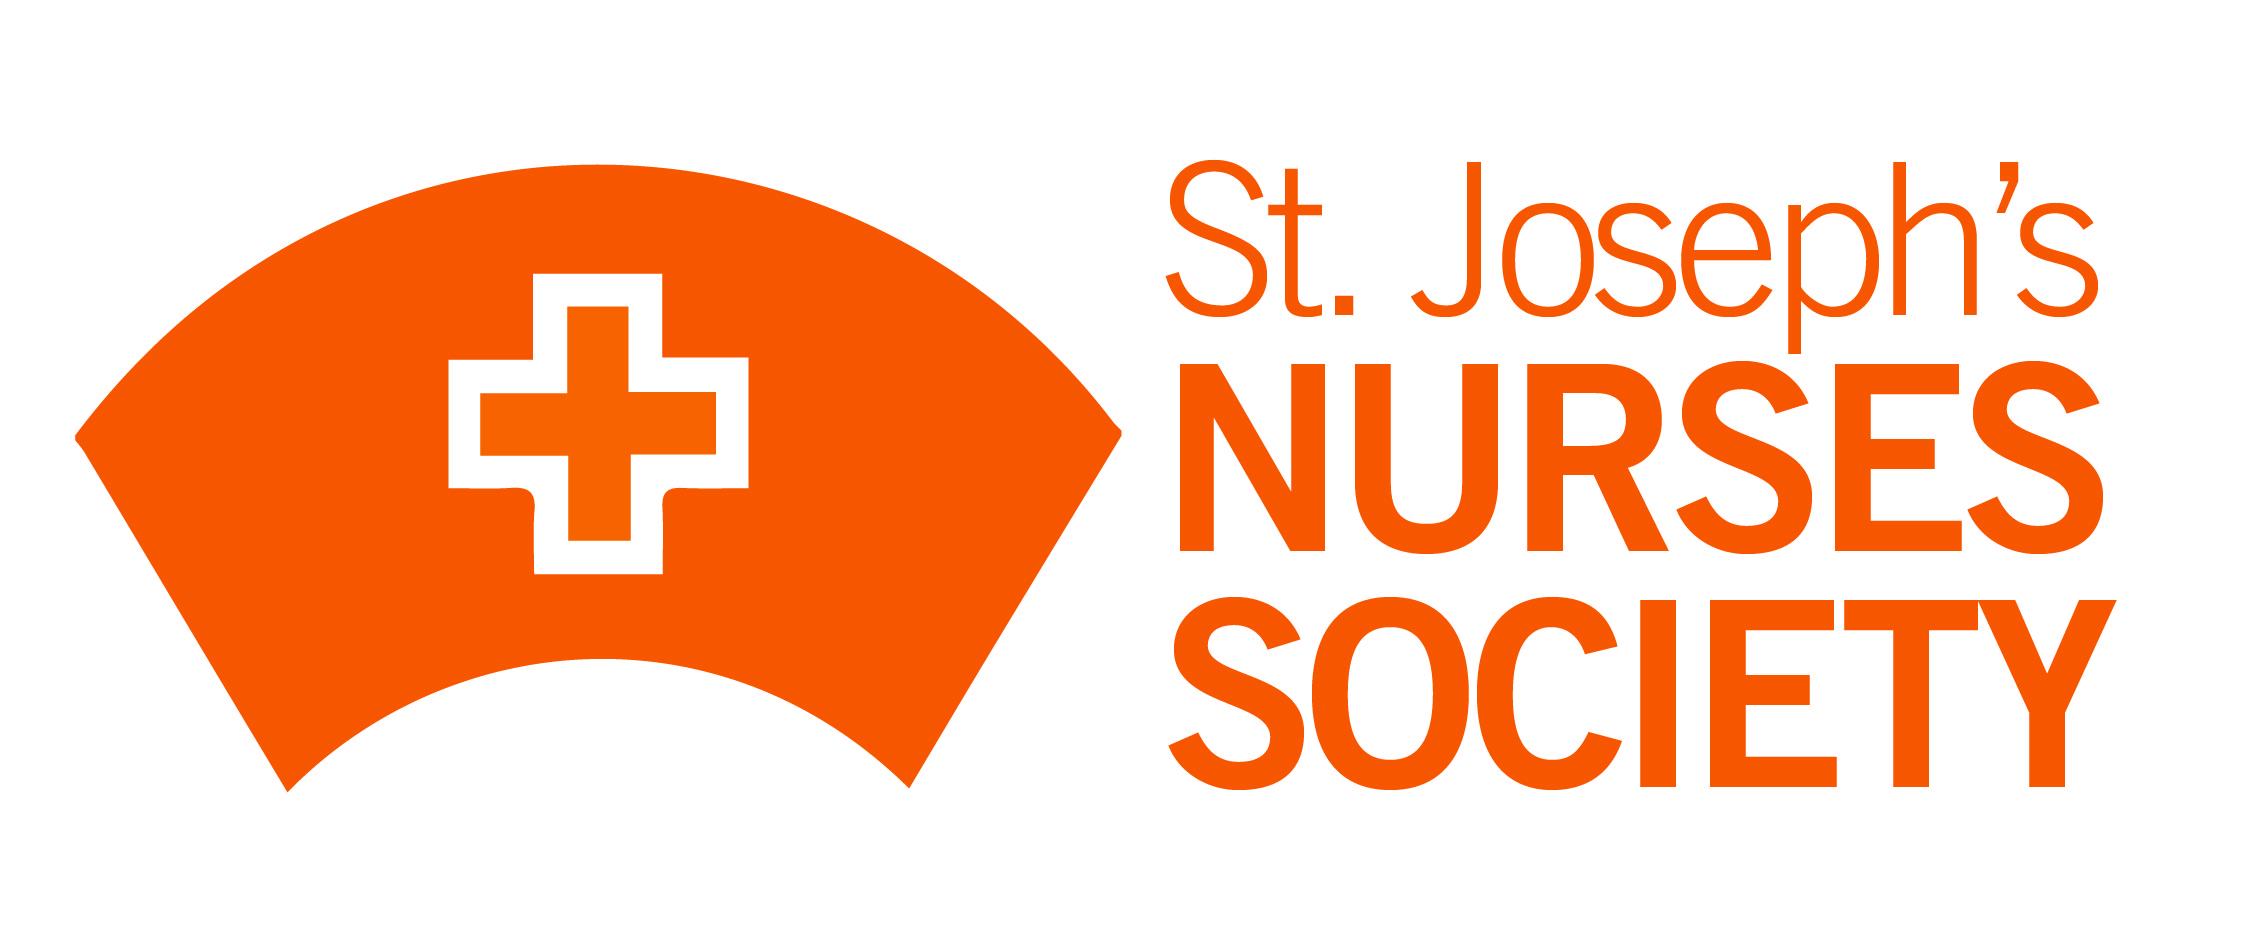 St. Joseph's Nurses Society